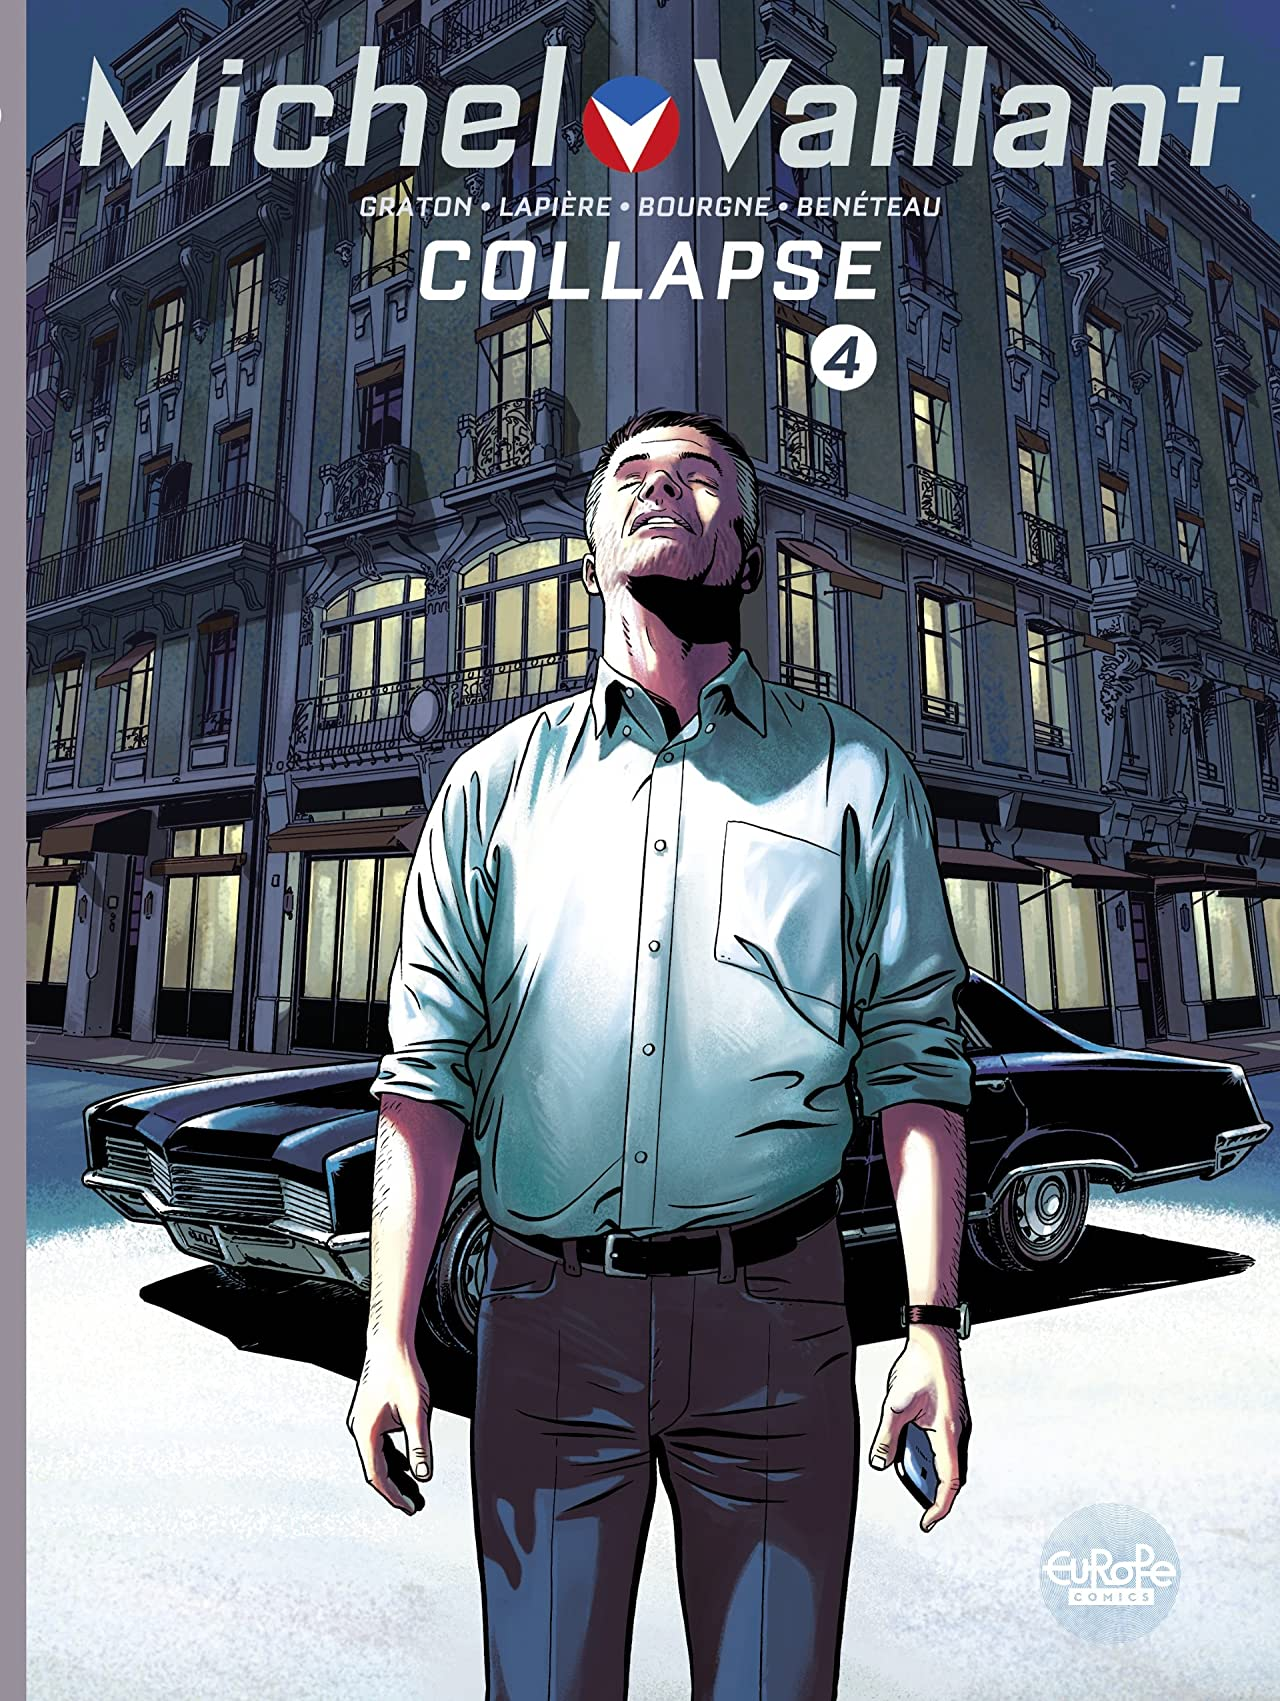 Michel Vaillant Vol. 4: Collapse